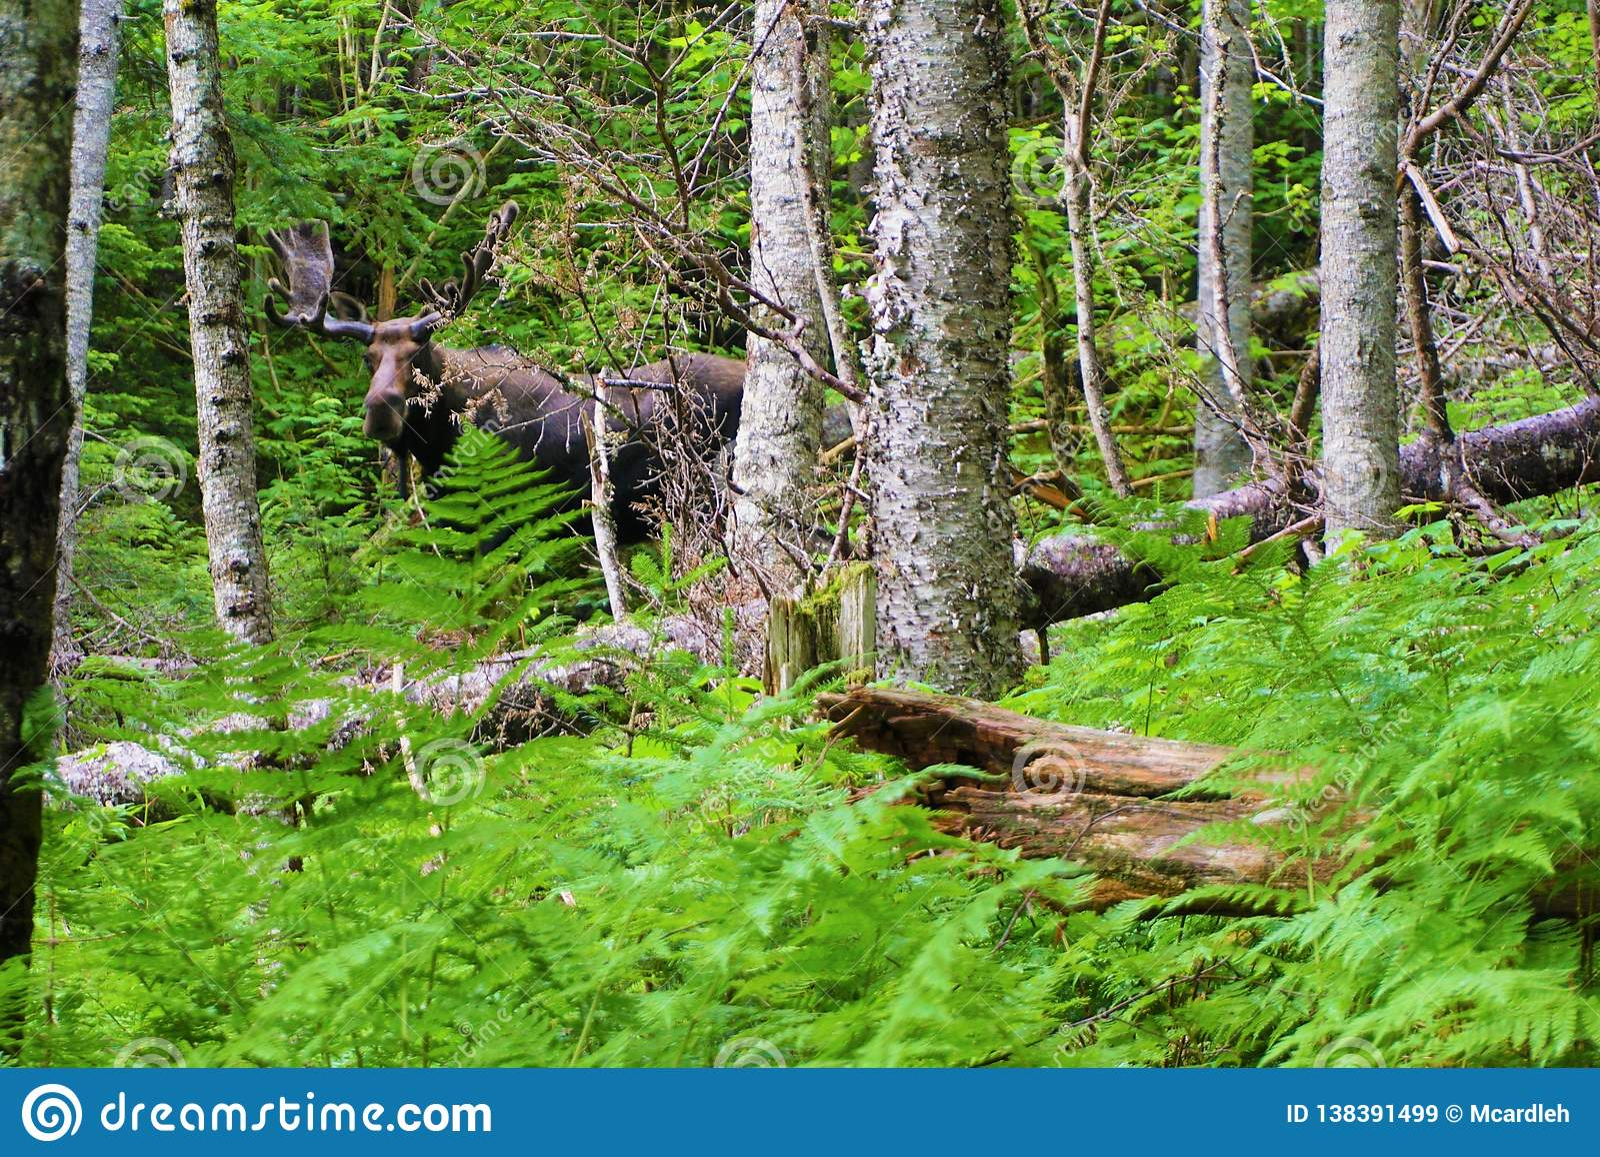 Adult moose with large velvet rack